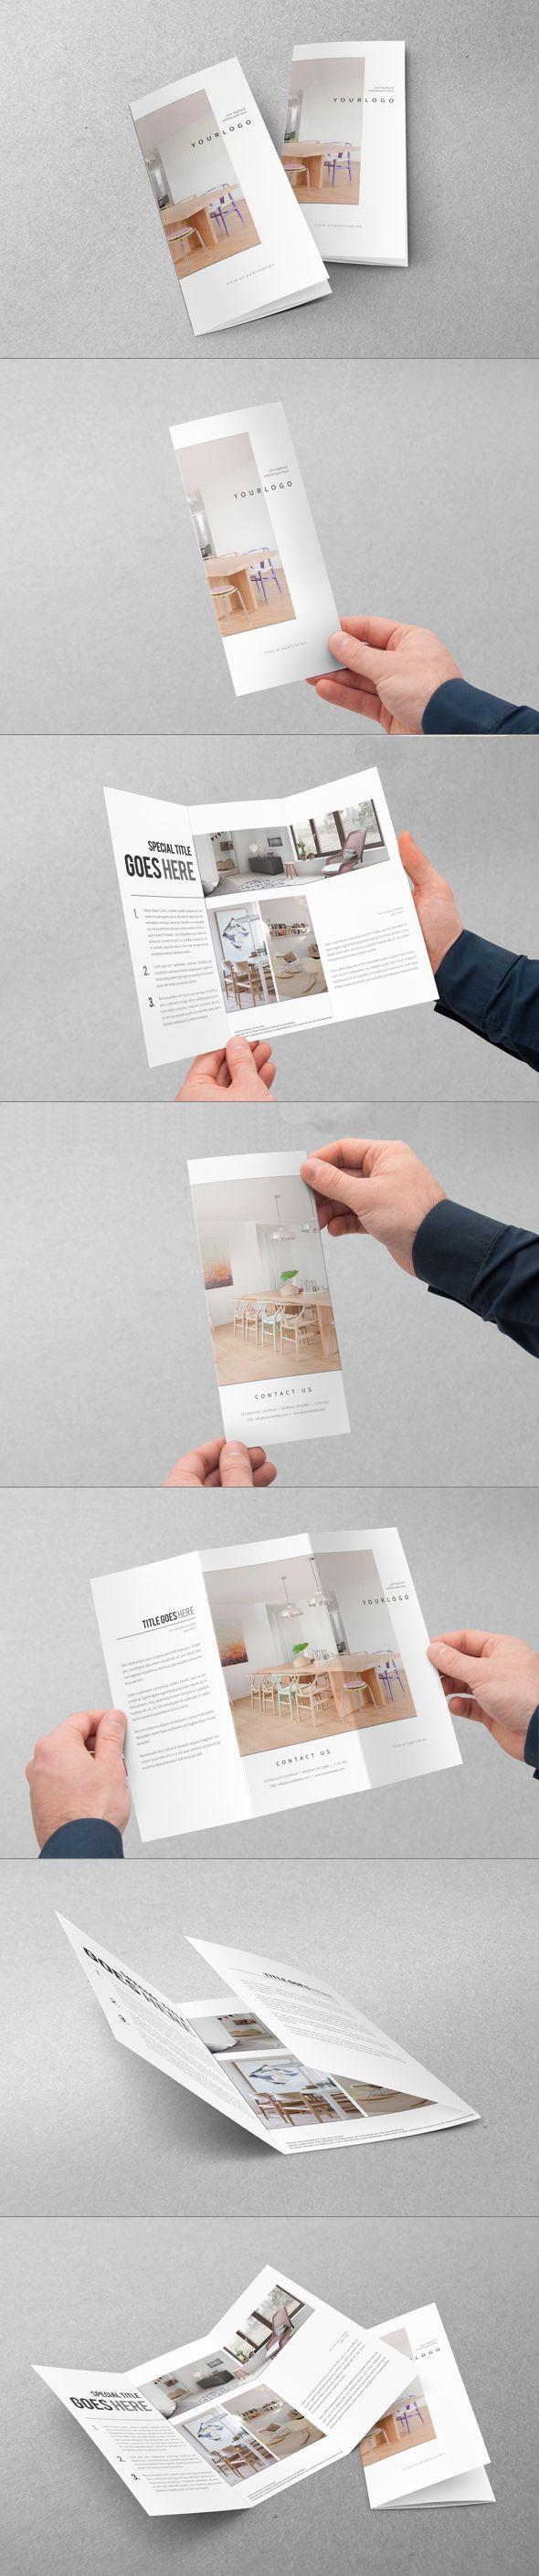 Minimal Interior Design Trifold on Behance More